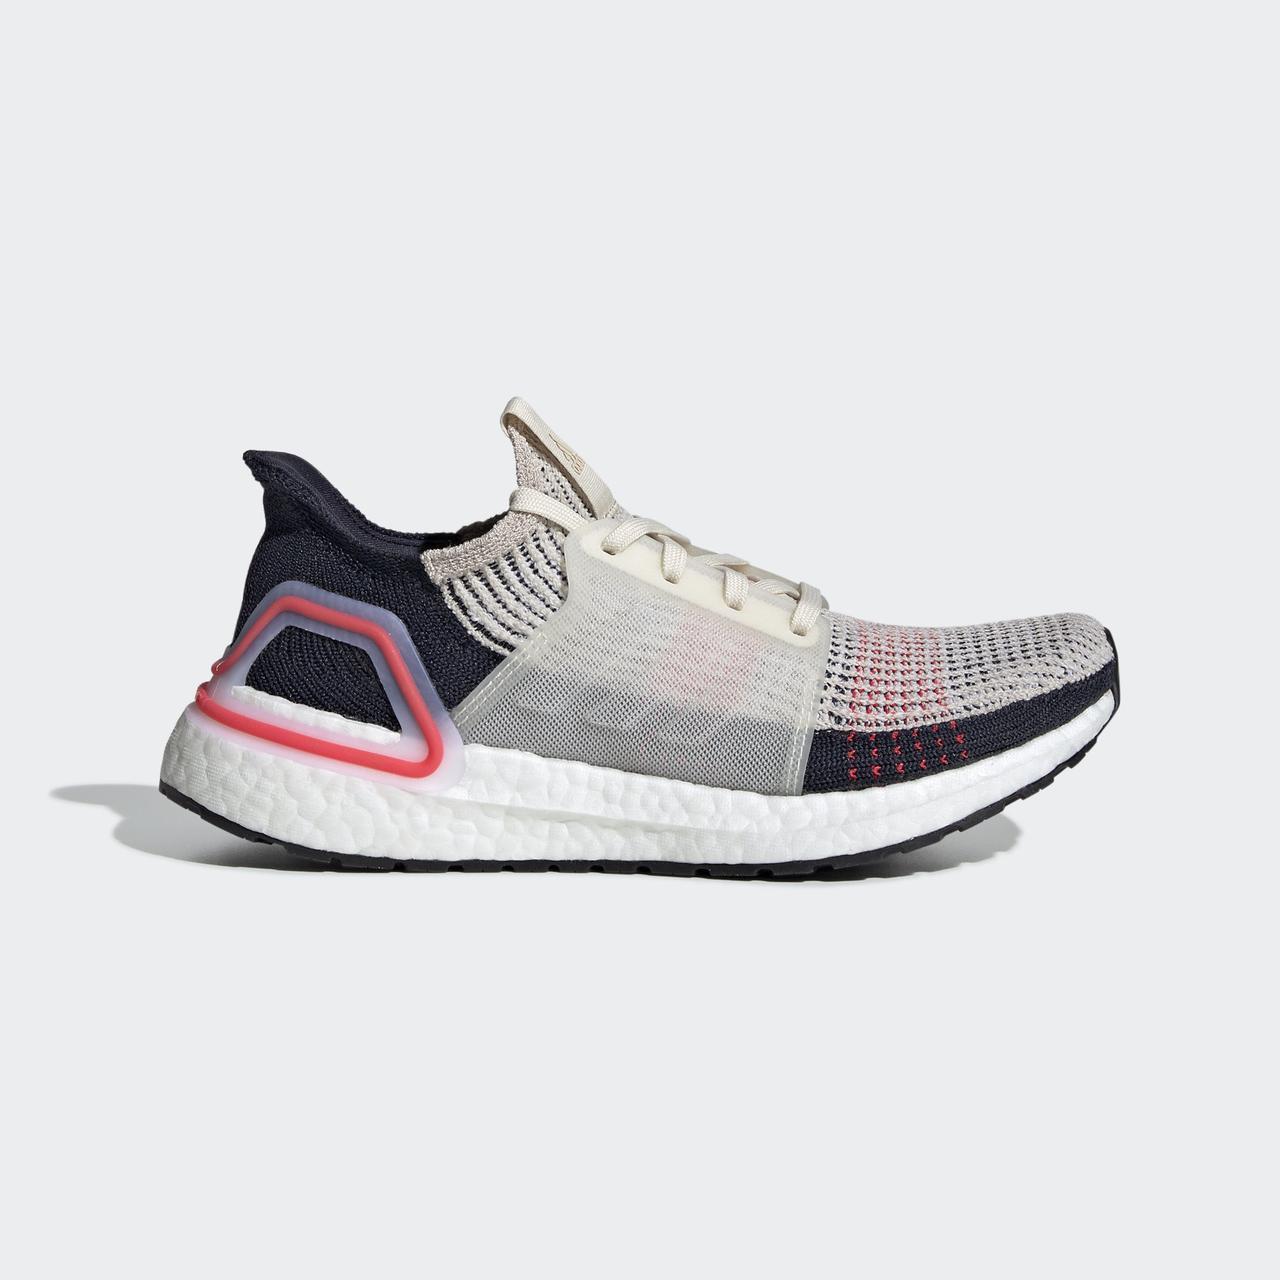 dc6982be Беговые кроссовки Adidas UltraBOOST 19 W F35284 - 2019: продажа ...